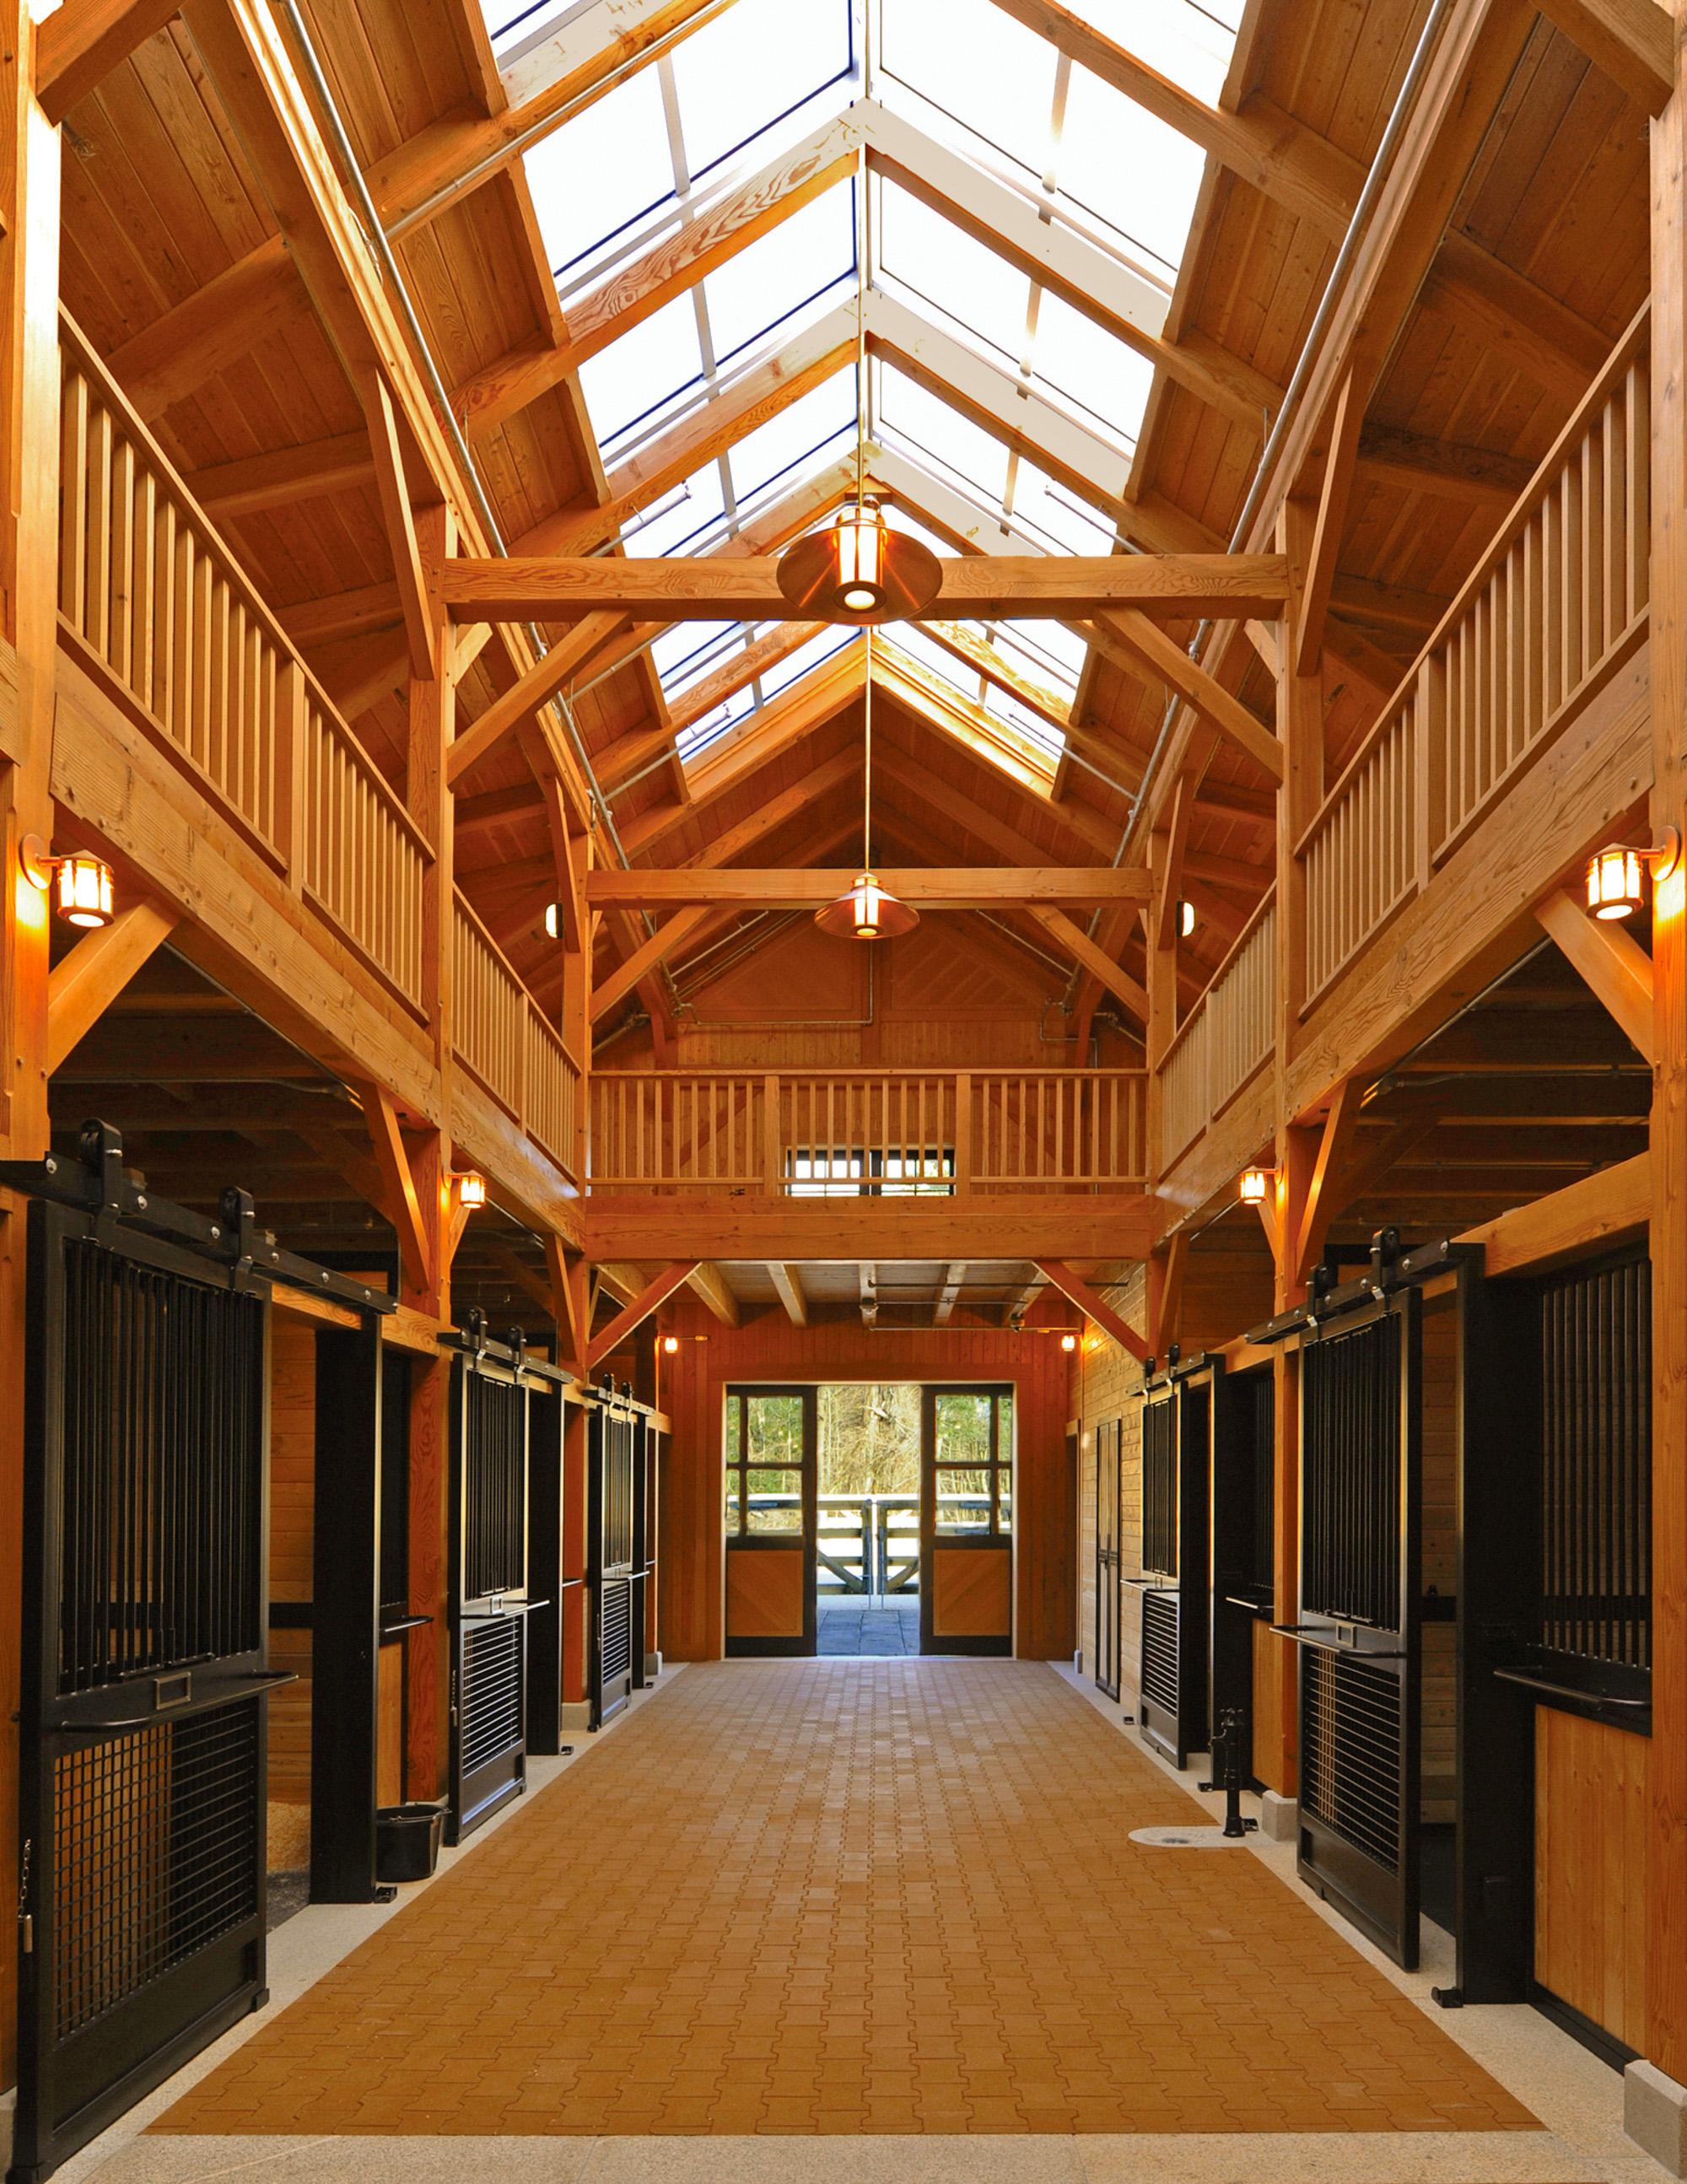 Beechwood Farm Slc Interiors